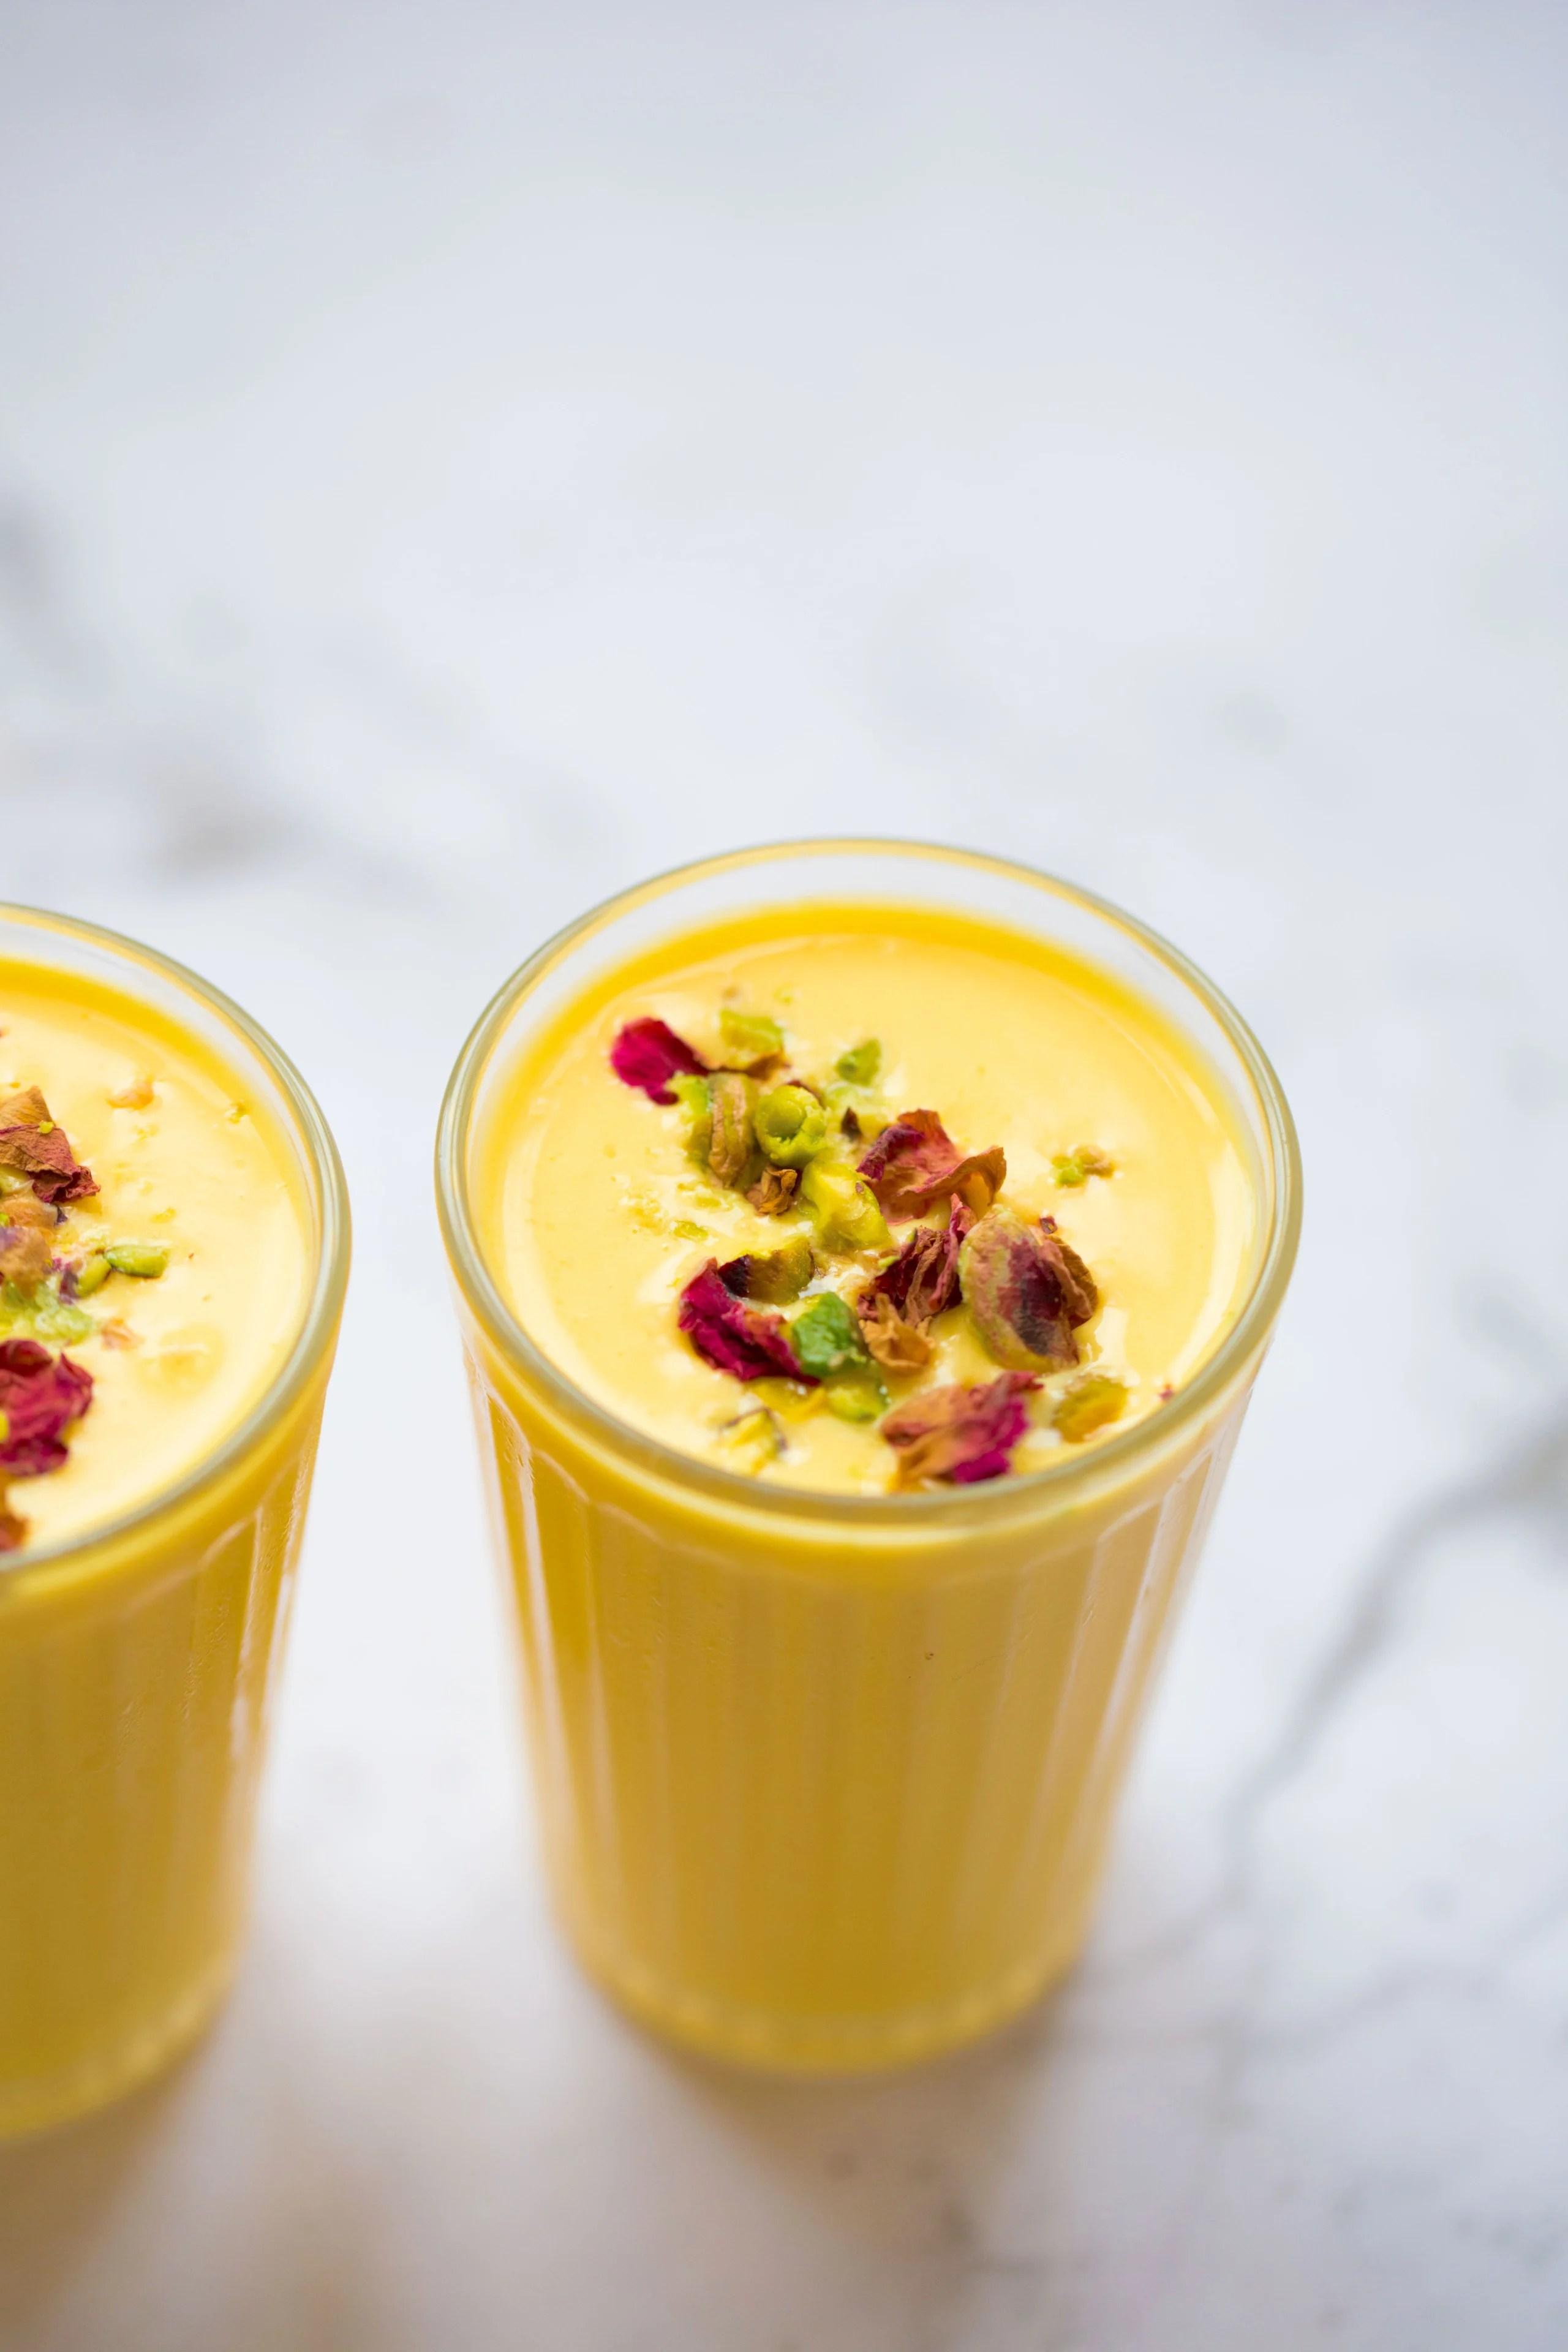 Skinny Rose Petal Mango Lassi with Pistachios and Cardamom